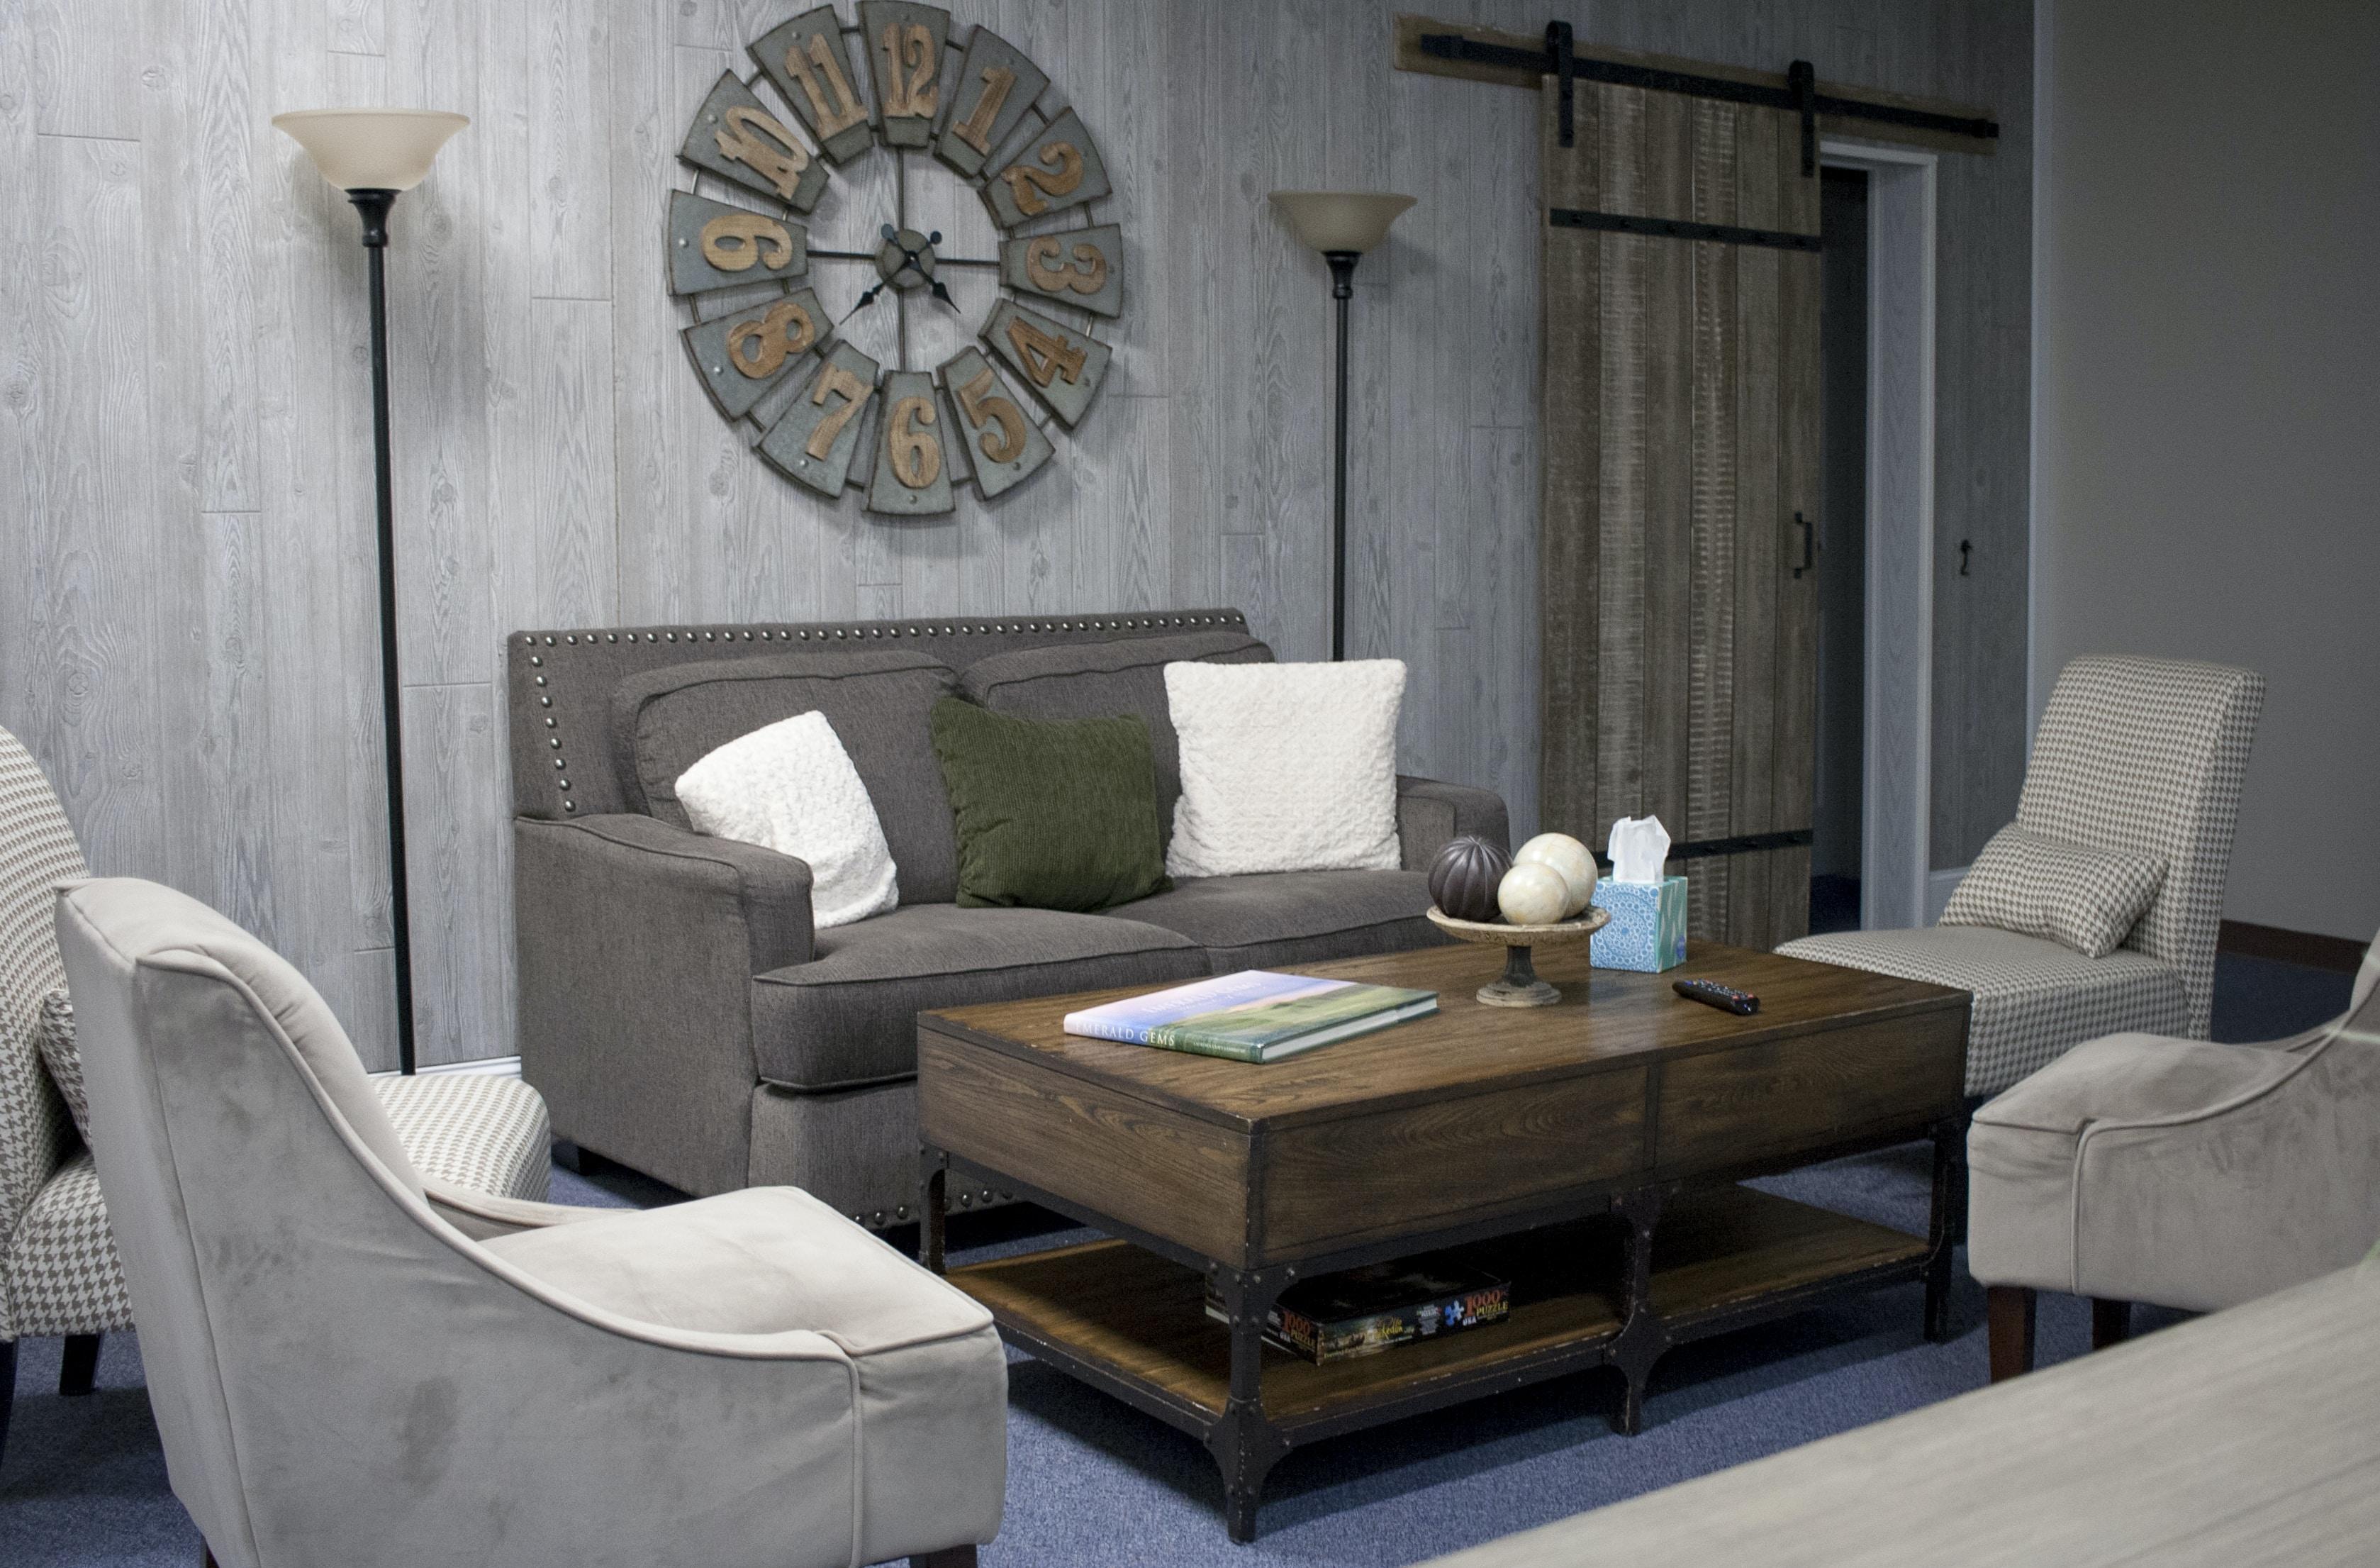 Rustic style living room interior design